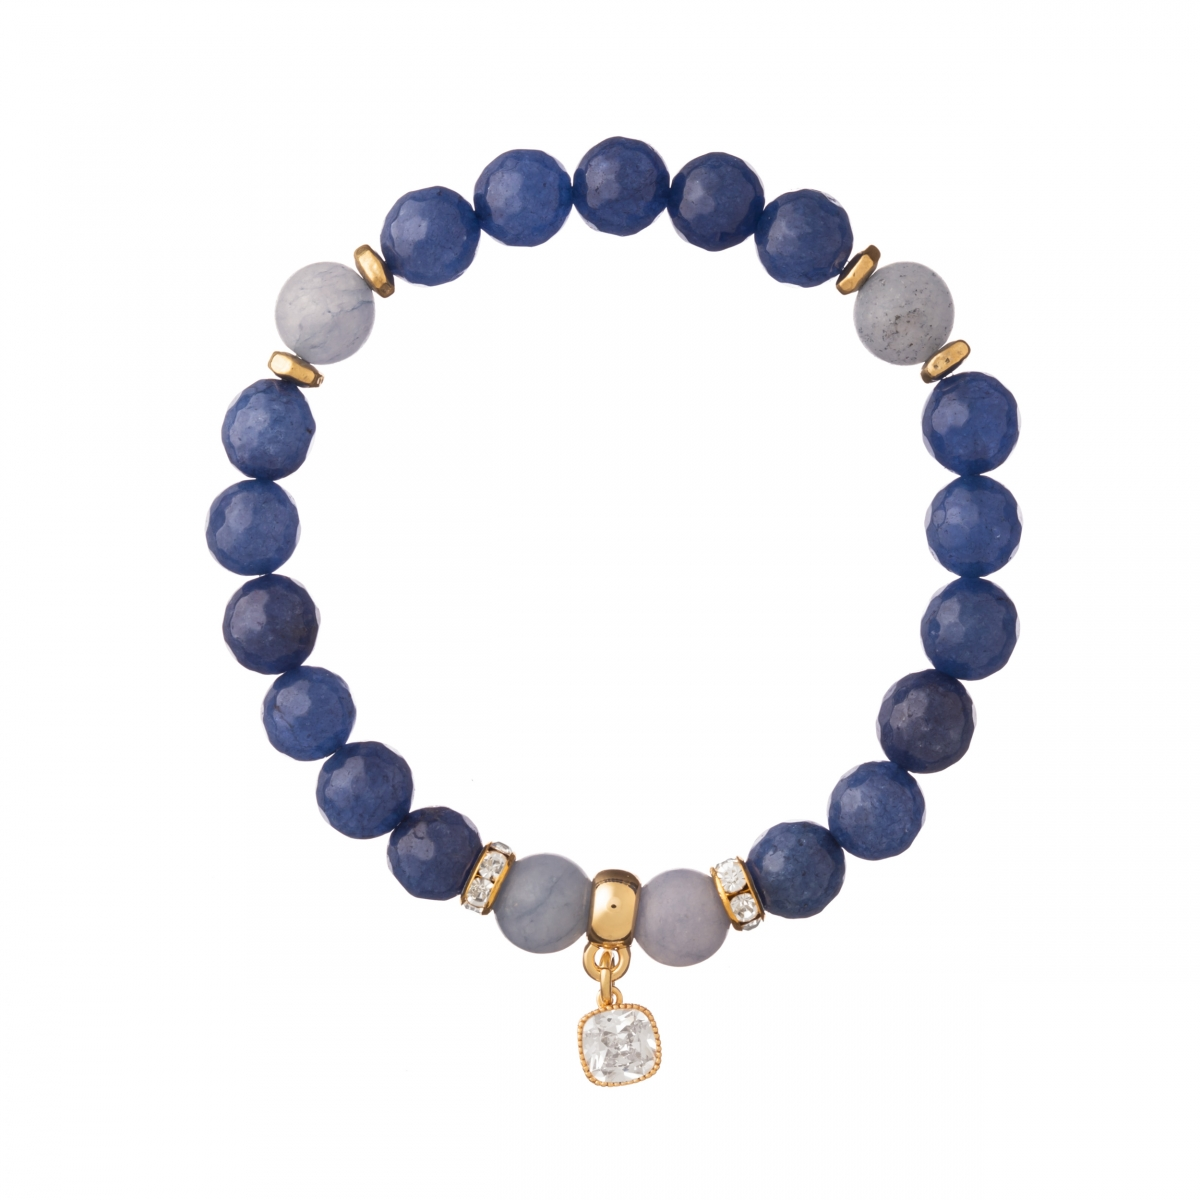 Náramok Mineral Blue Facet Jadeit Gold Zircon Crystal